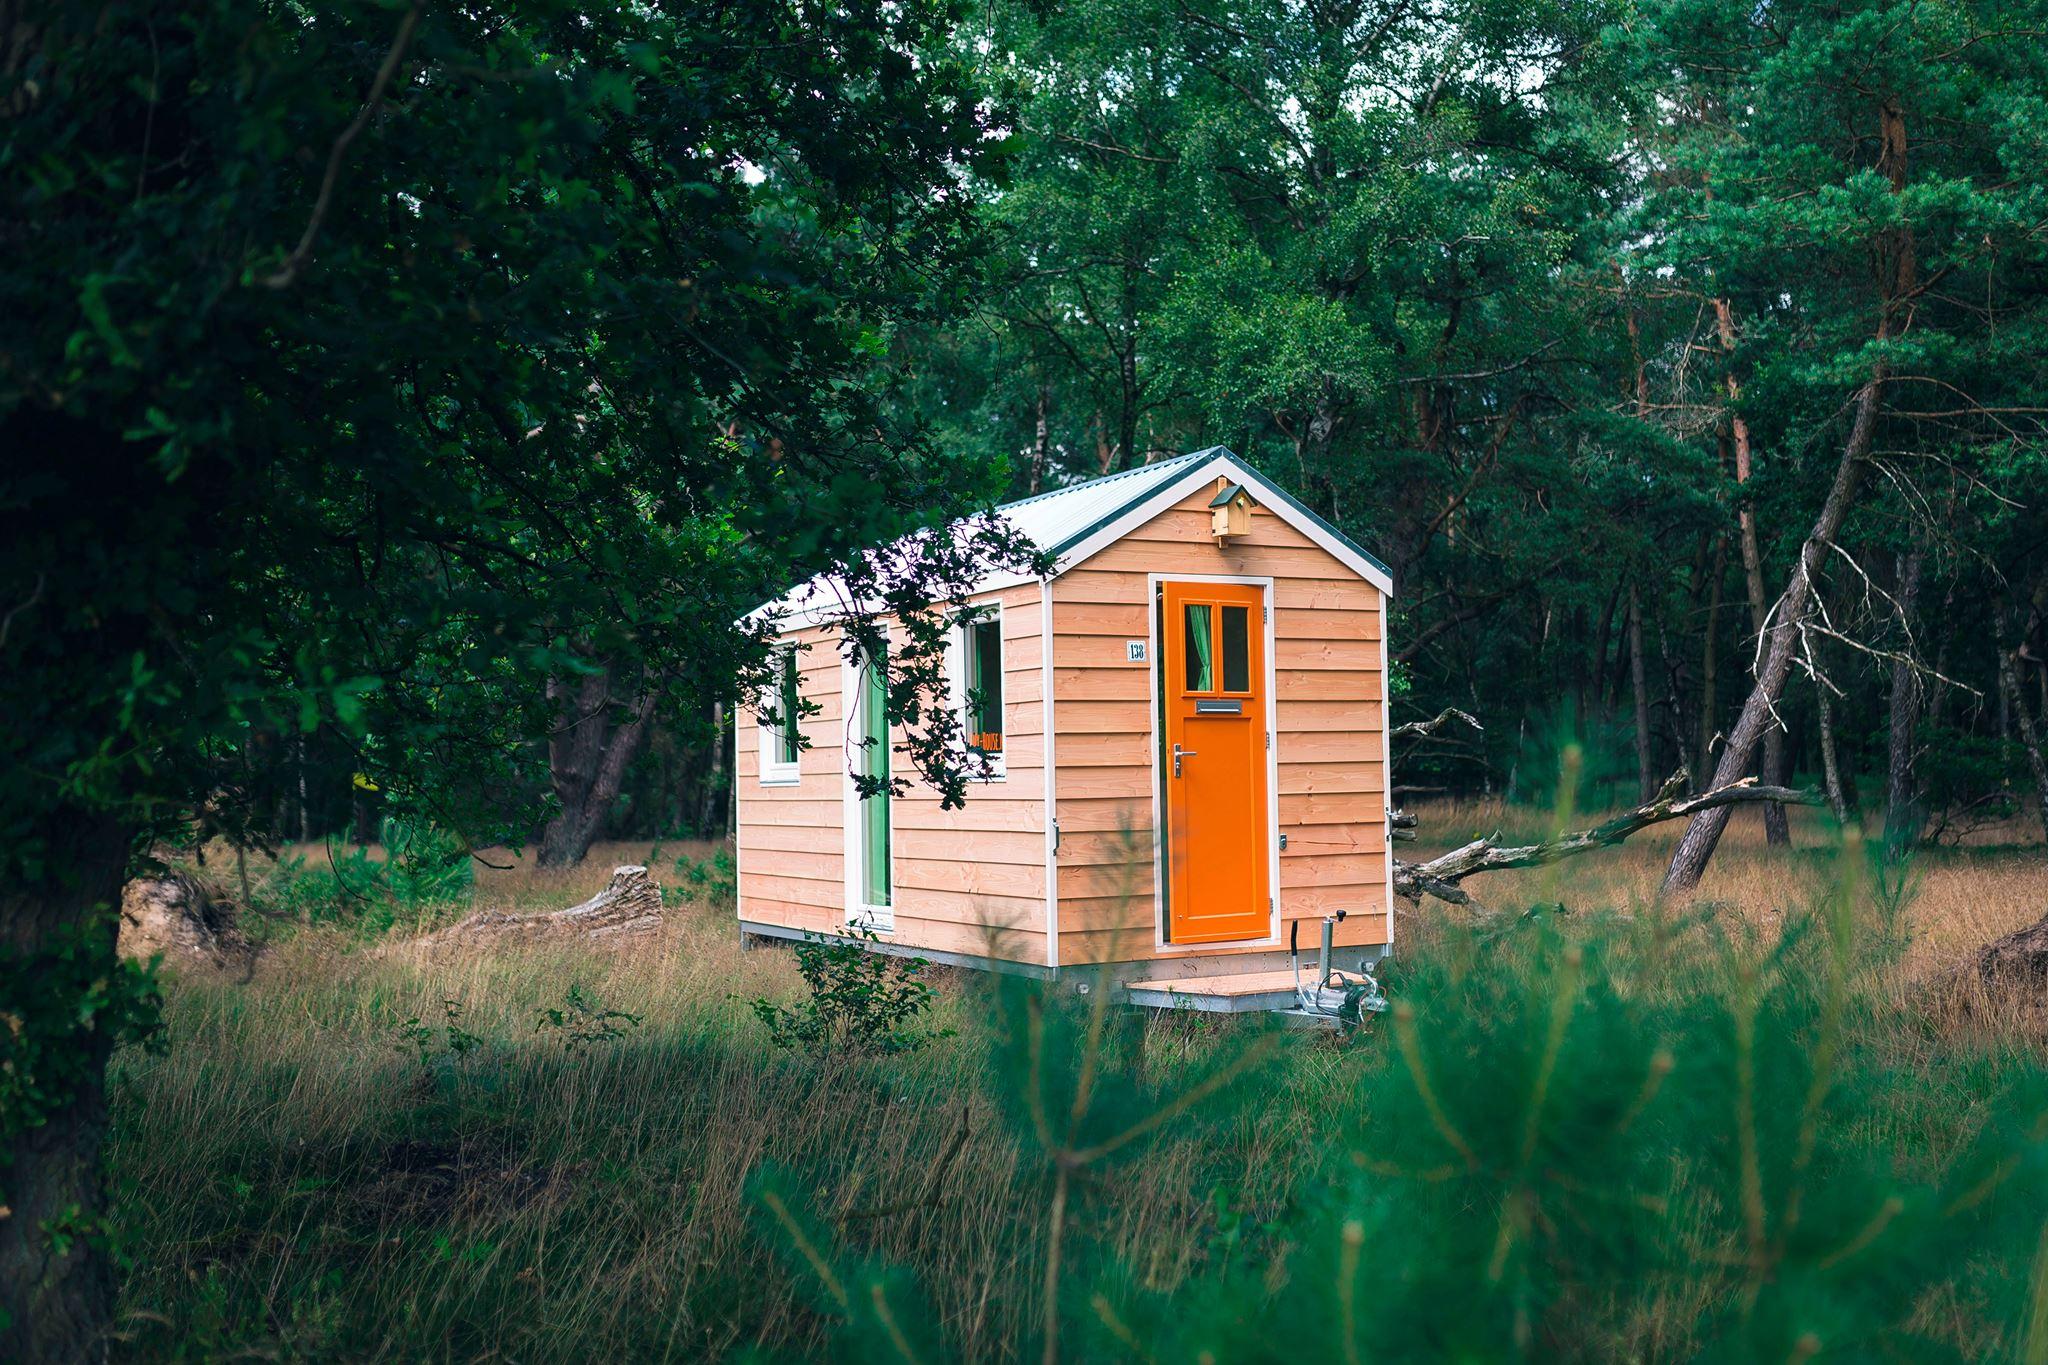 Dimka Wentzel bouwt tiny houses